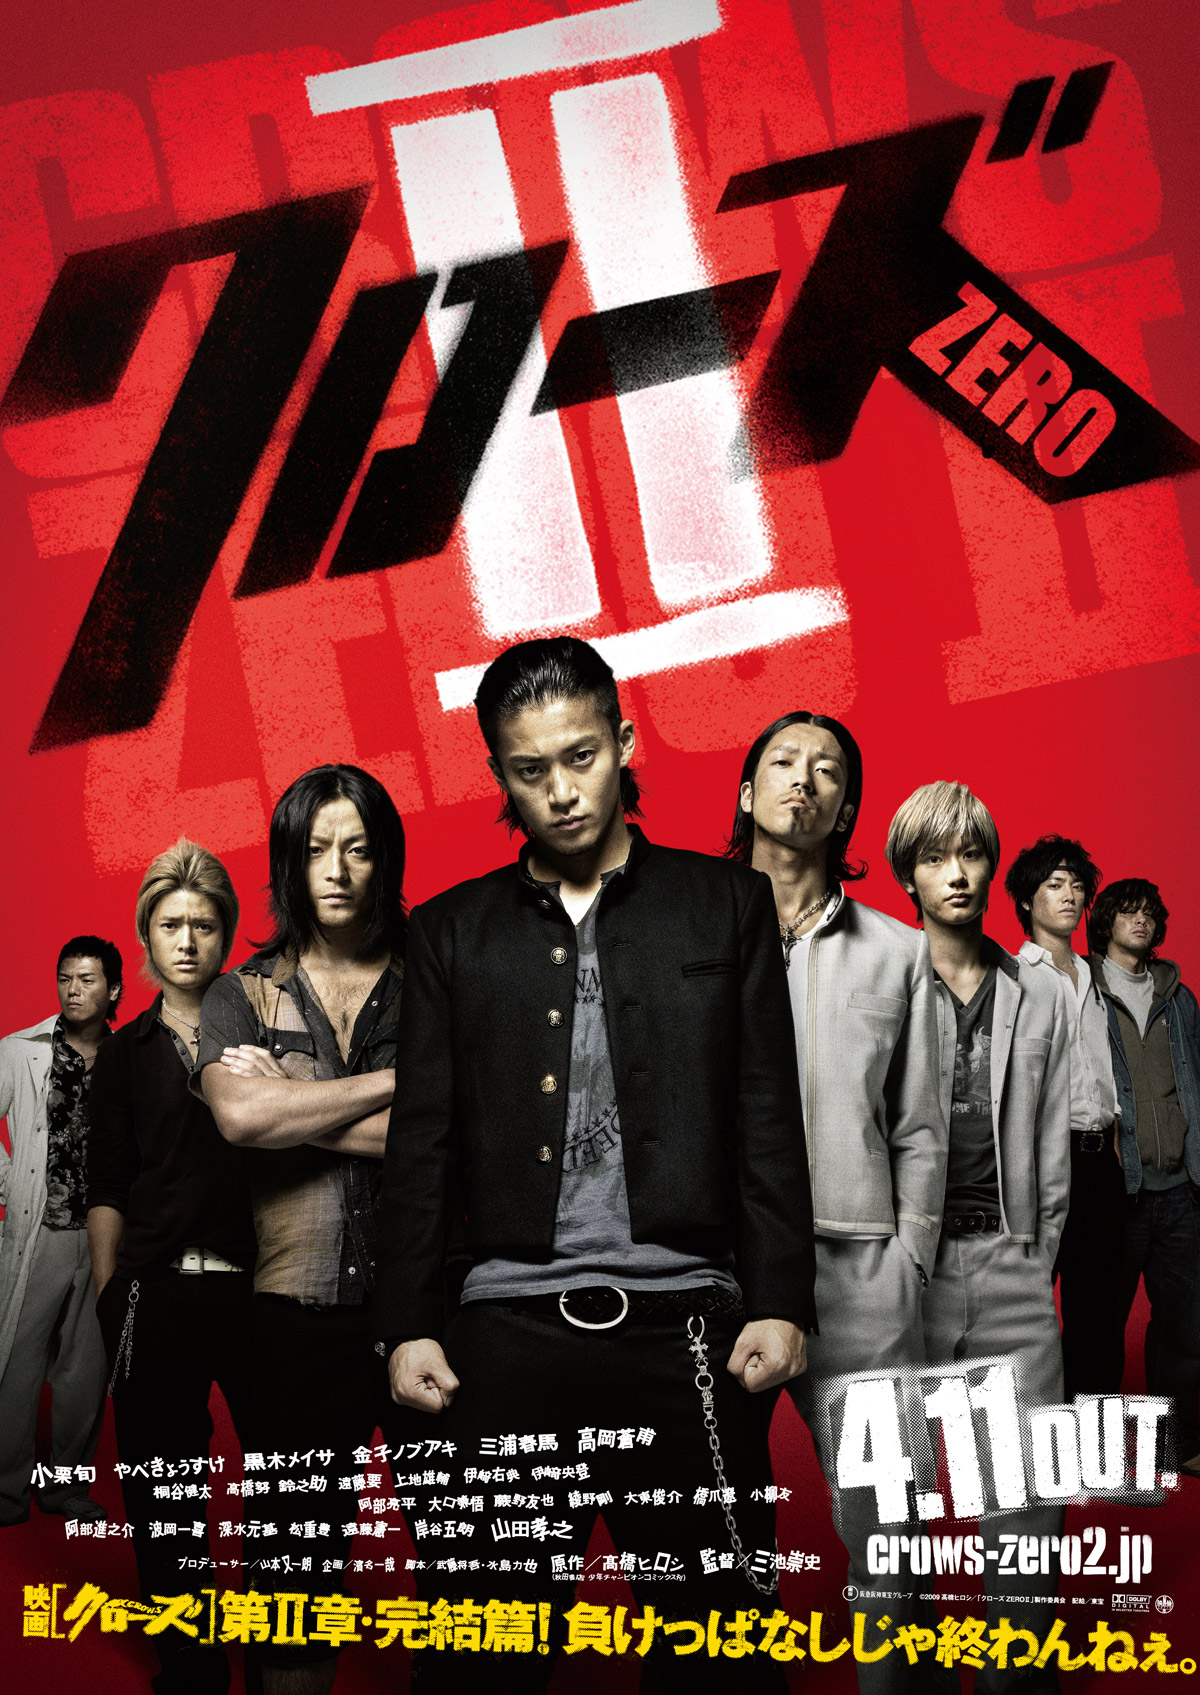 Download film crows zero 2 full movie subtitle indonesia download.